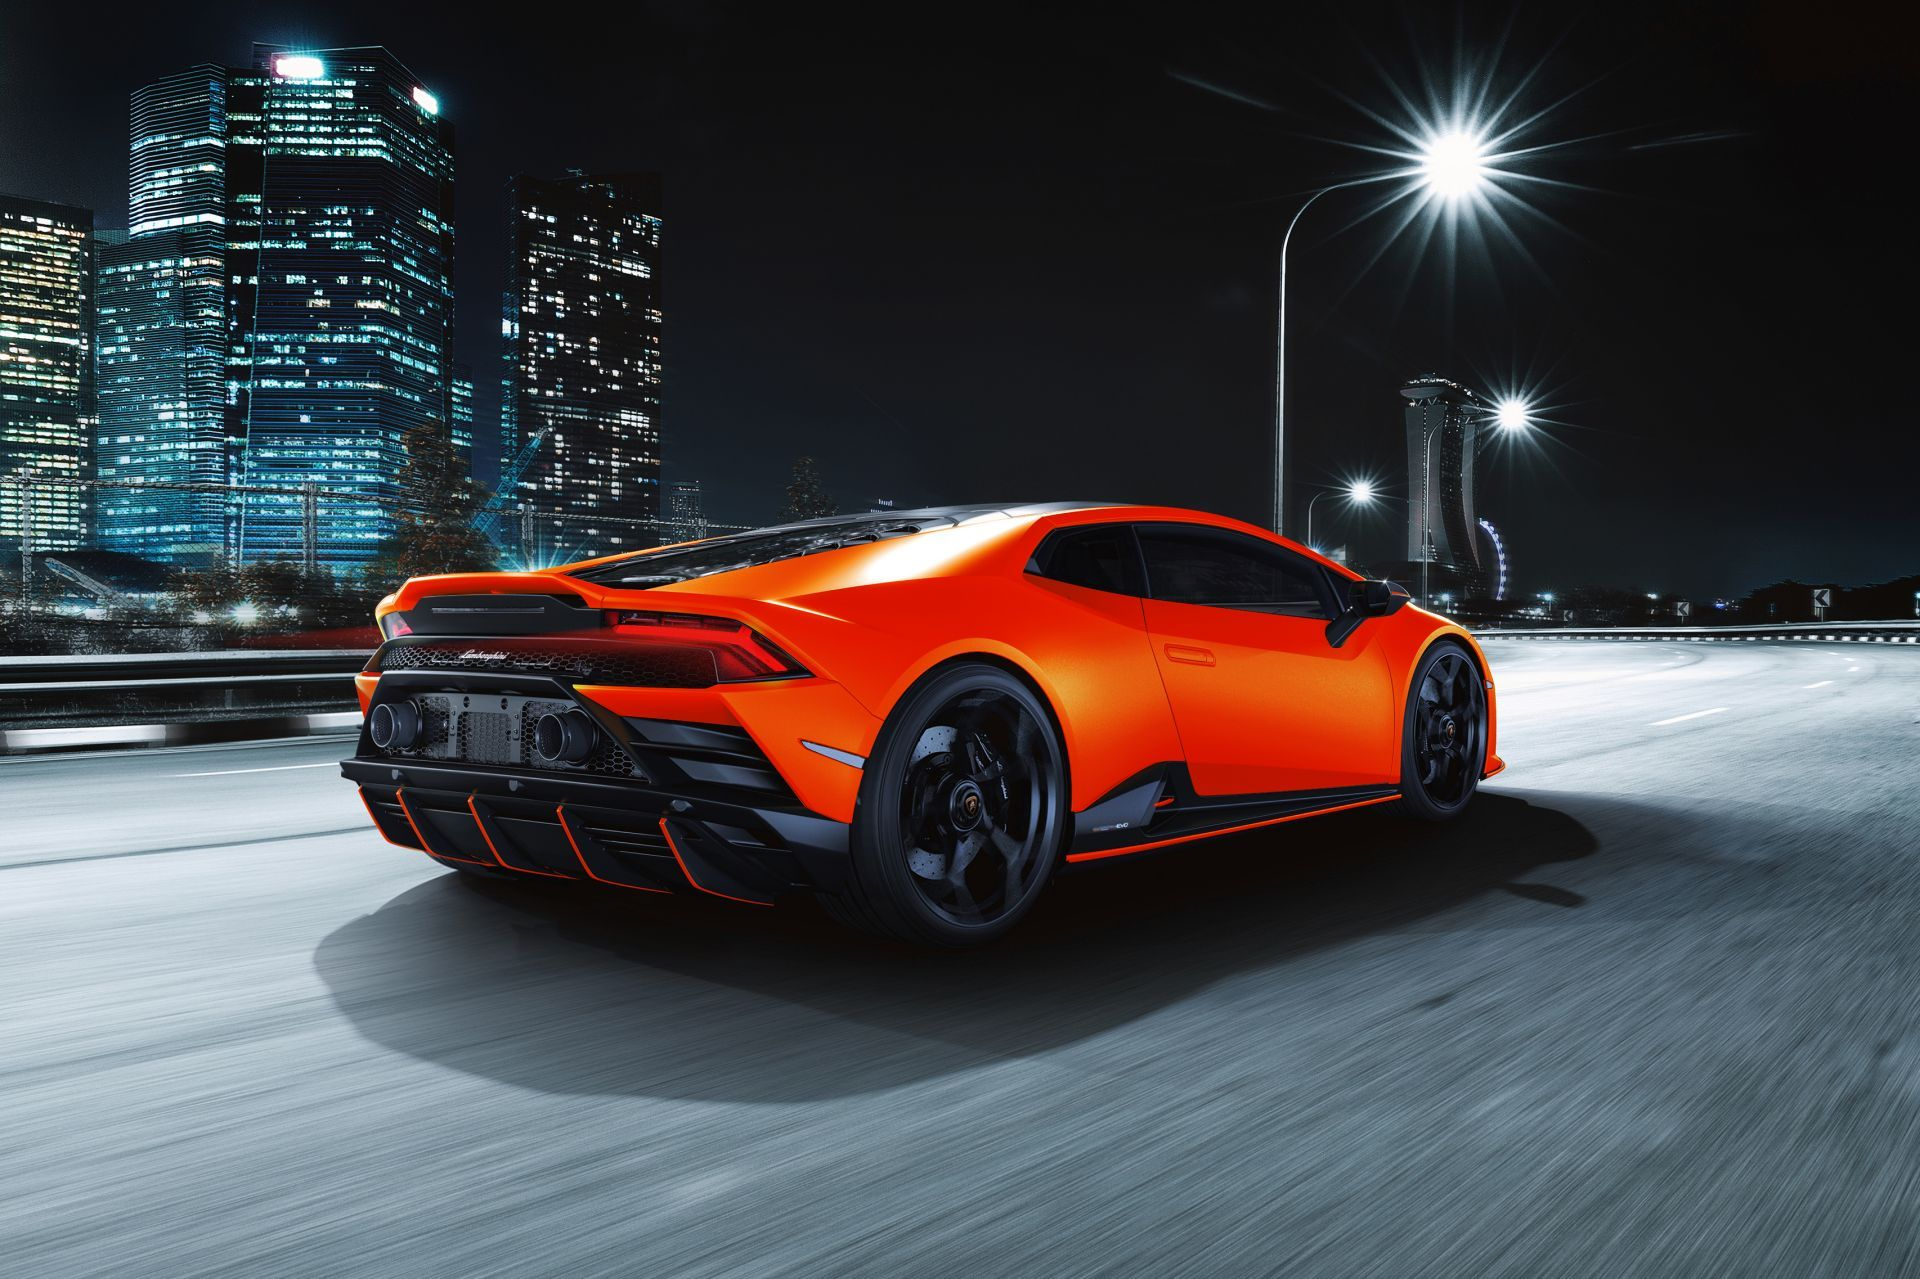 Lamborghini-Huracan-Evo-Fluo-Capsule-8